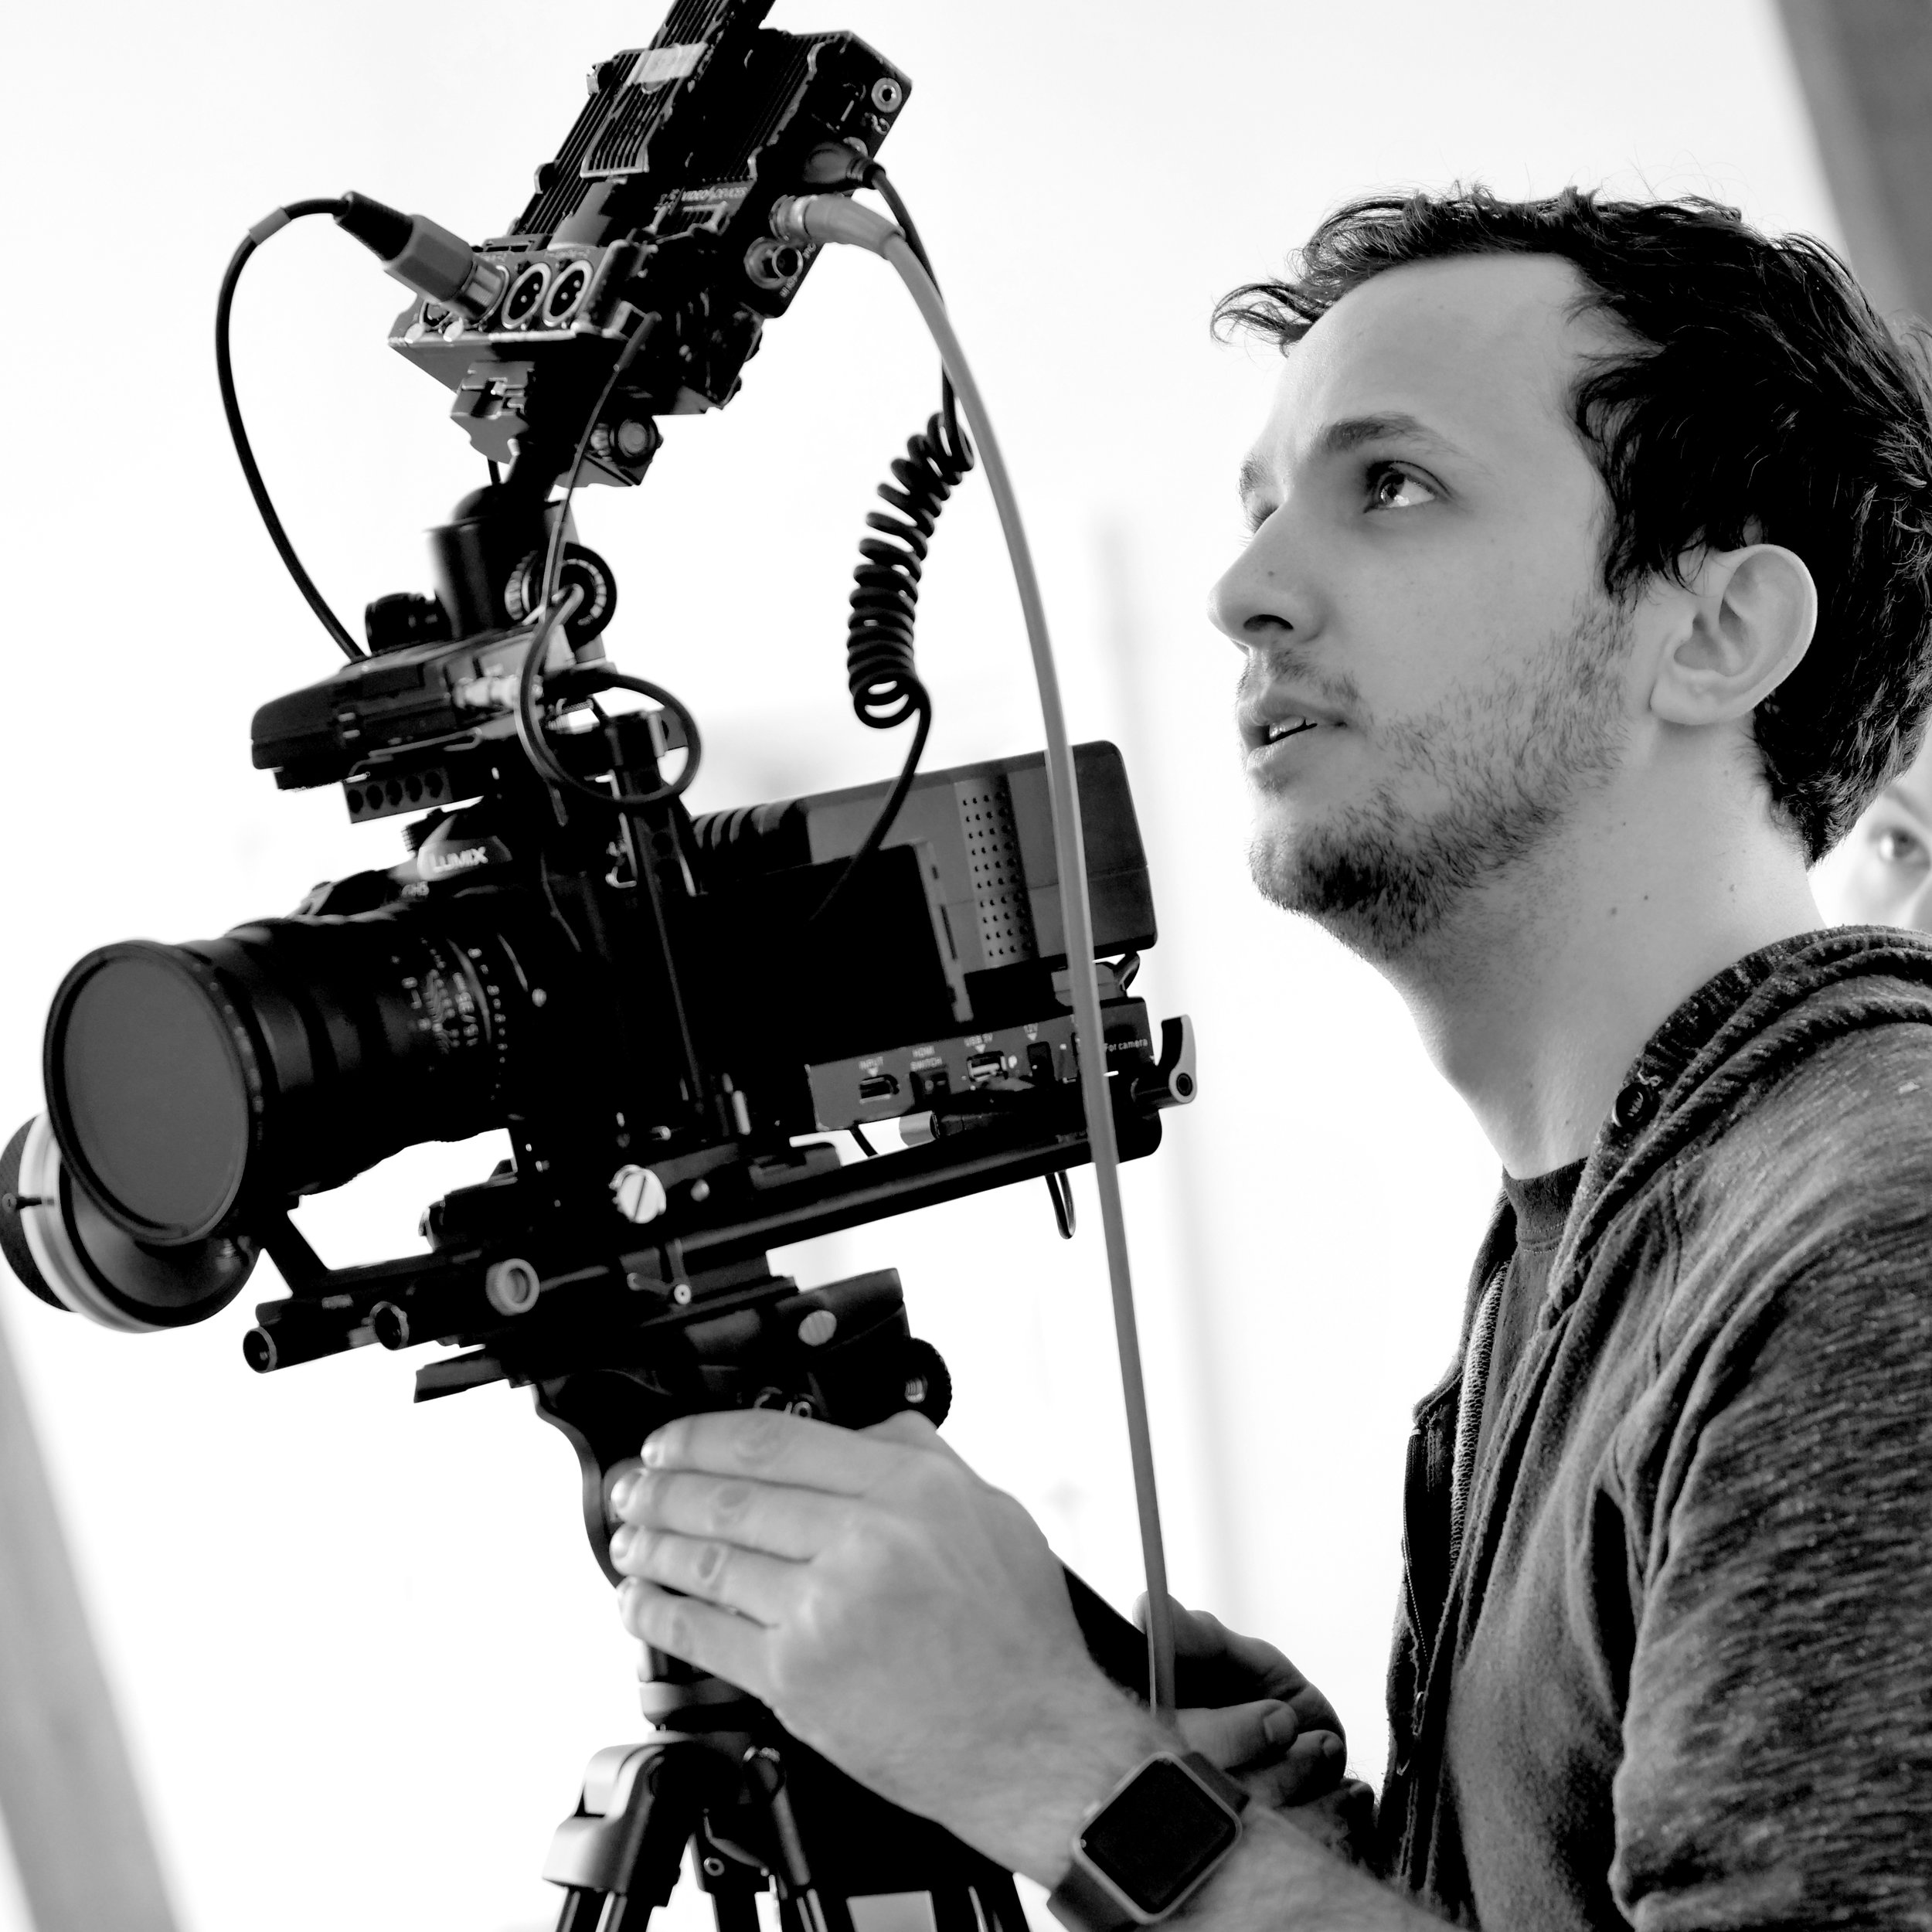 Mike Cerisano, Lead Videographer & Editor